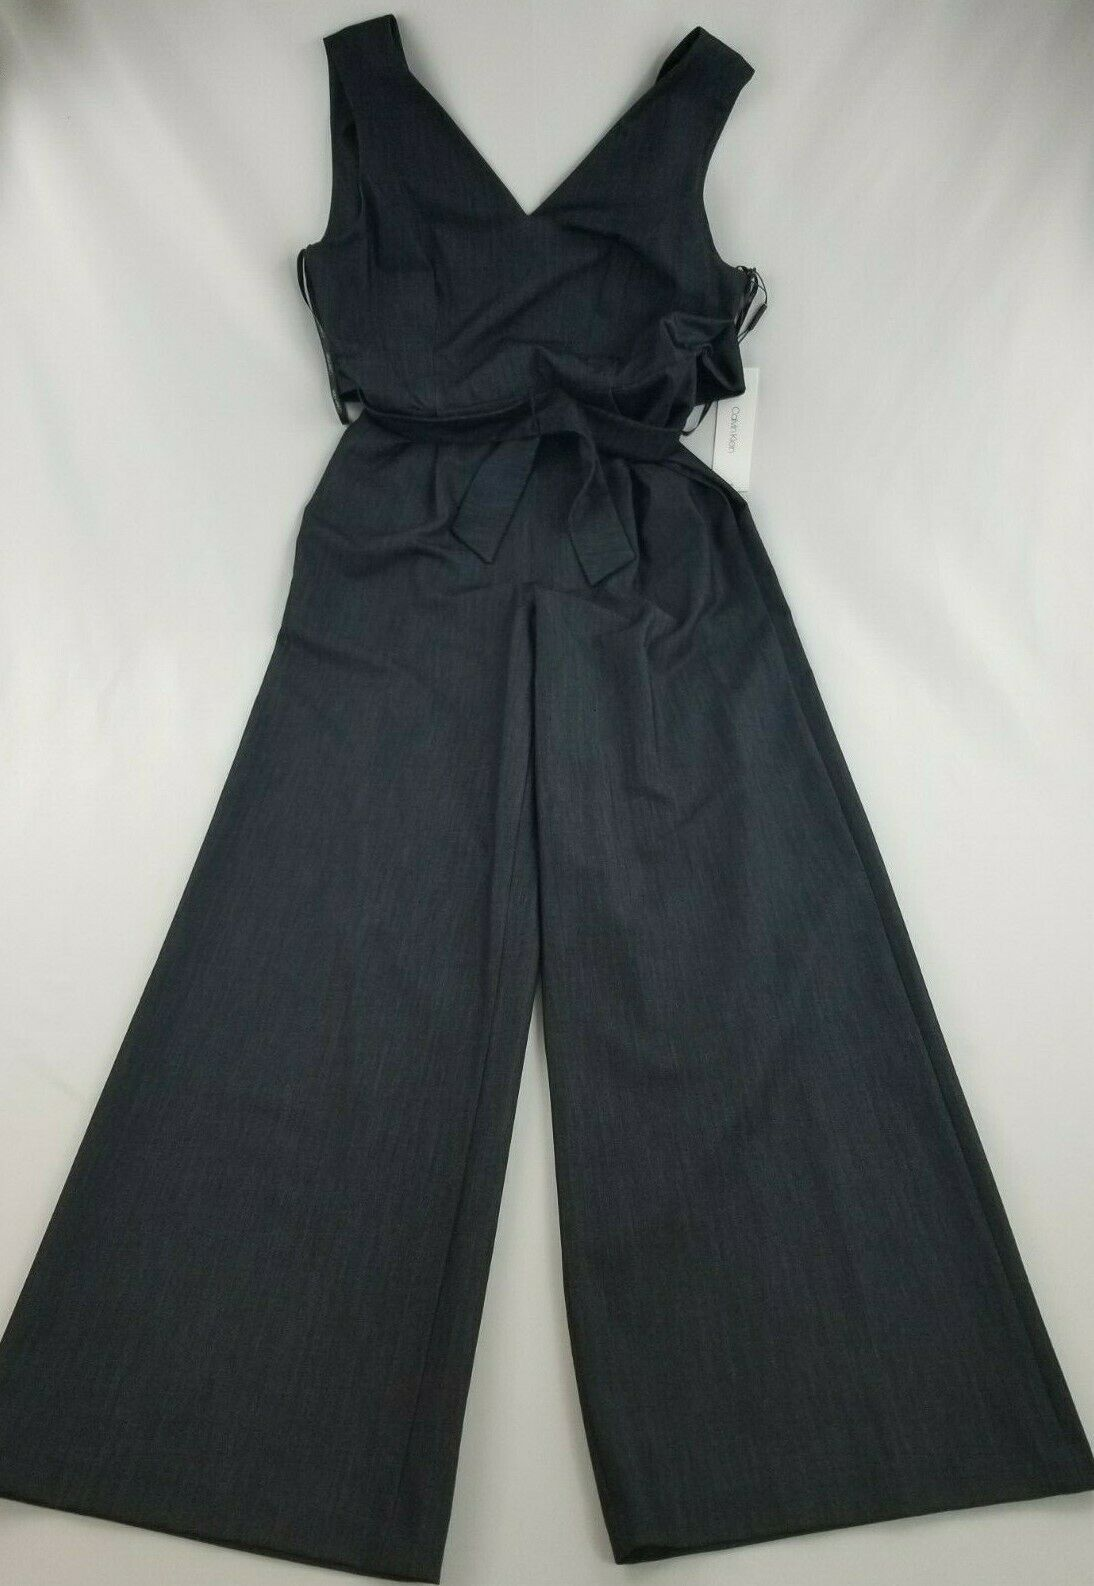 Nuevo Calvin Klein Mujer Mono Mono Pantalones Top CD9D11MT Azul Marino 4 Msrp image 3